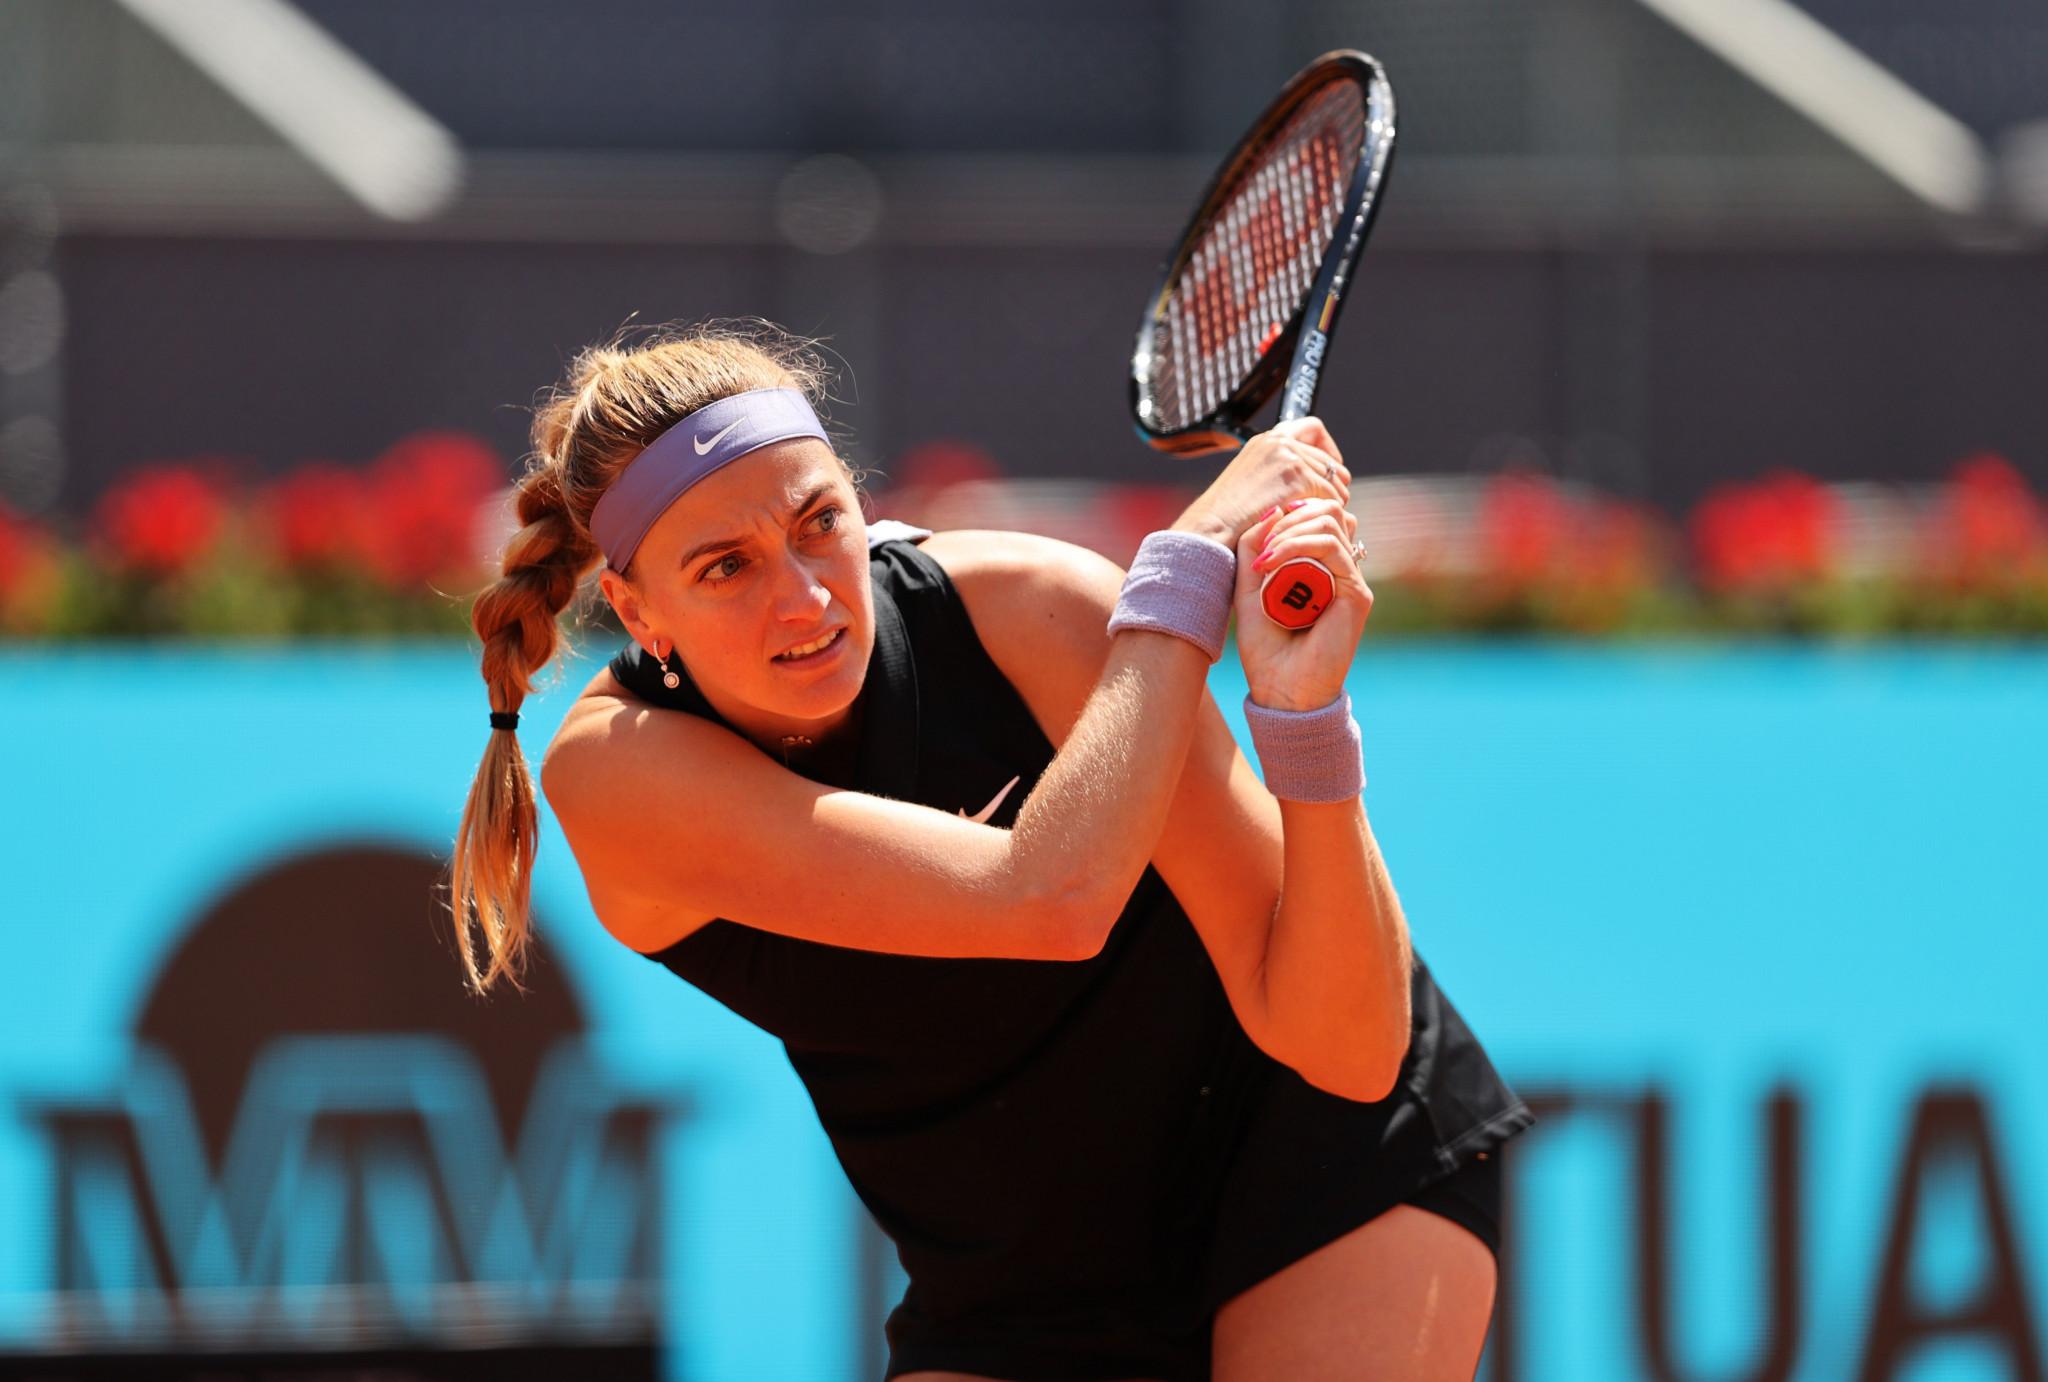 Kvitová on track for fourth Madrid Open title after passing last-16 test